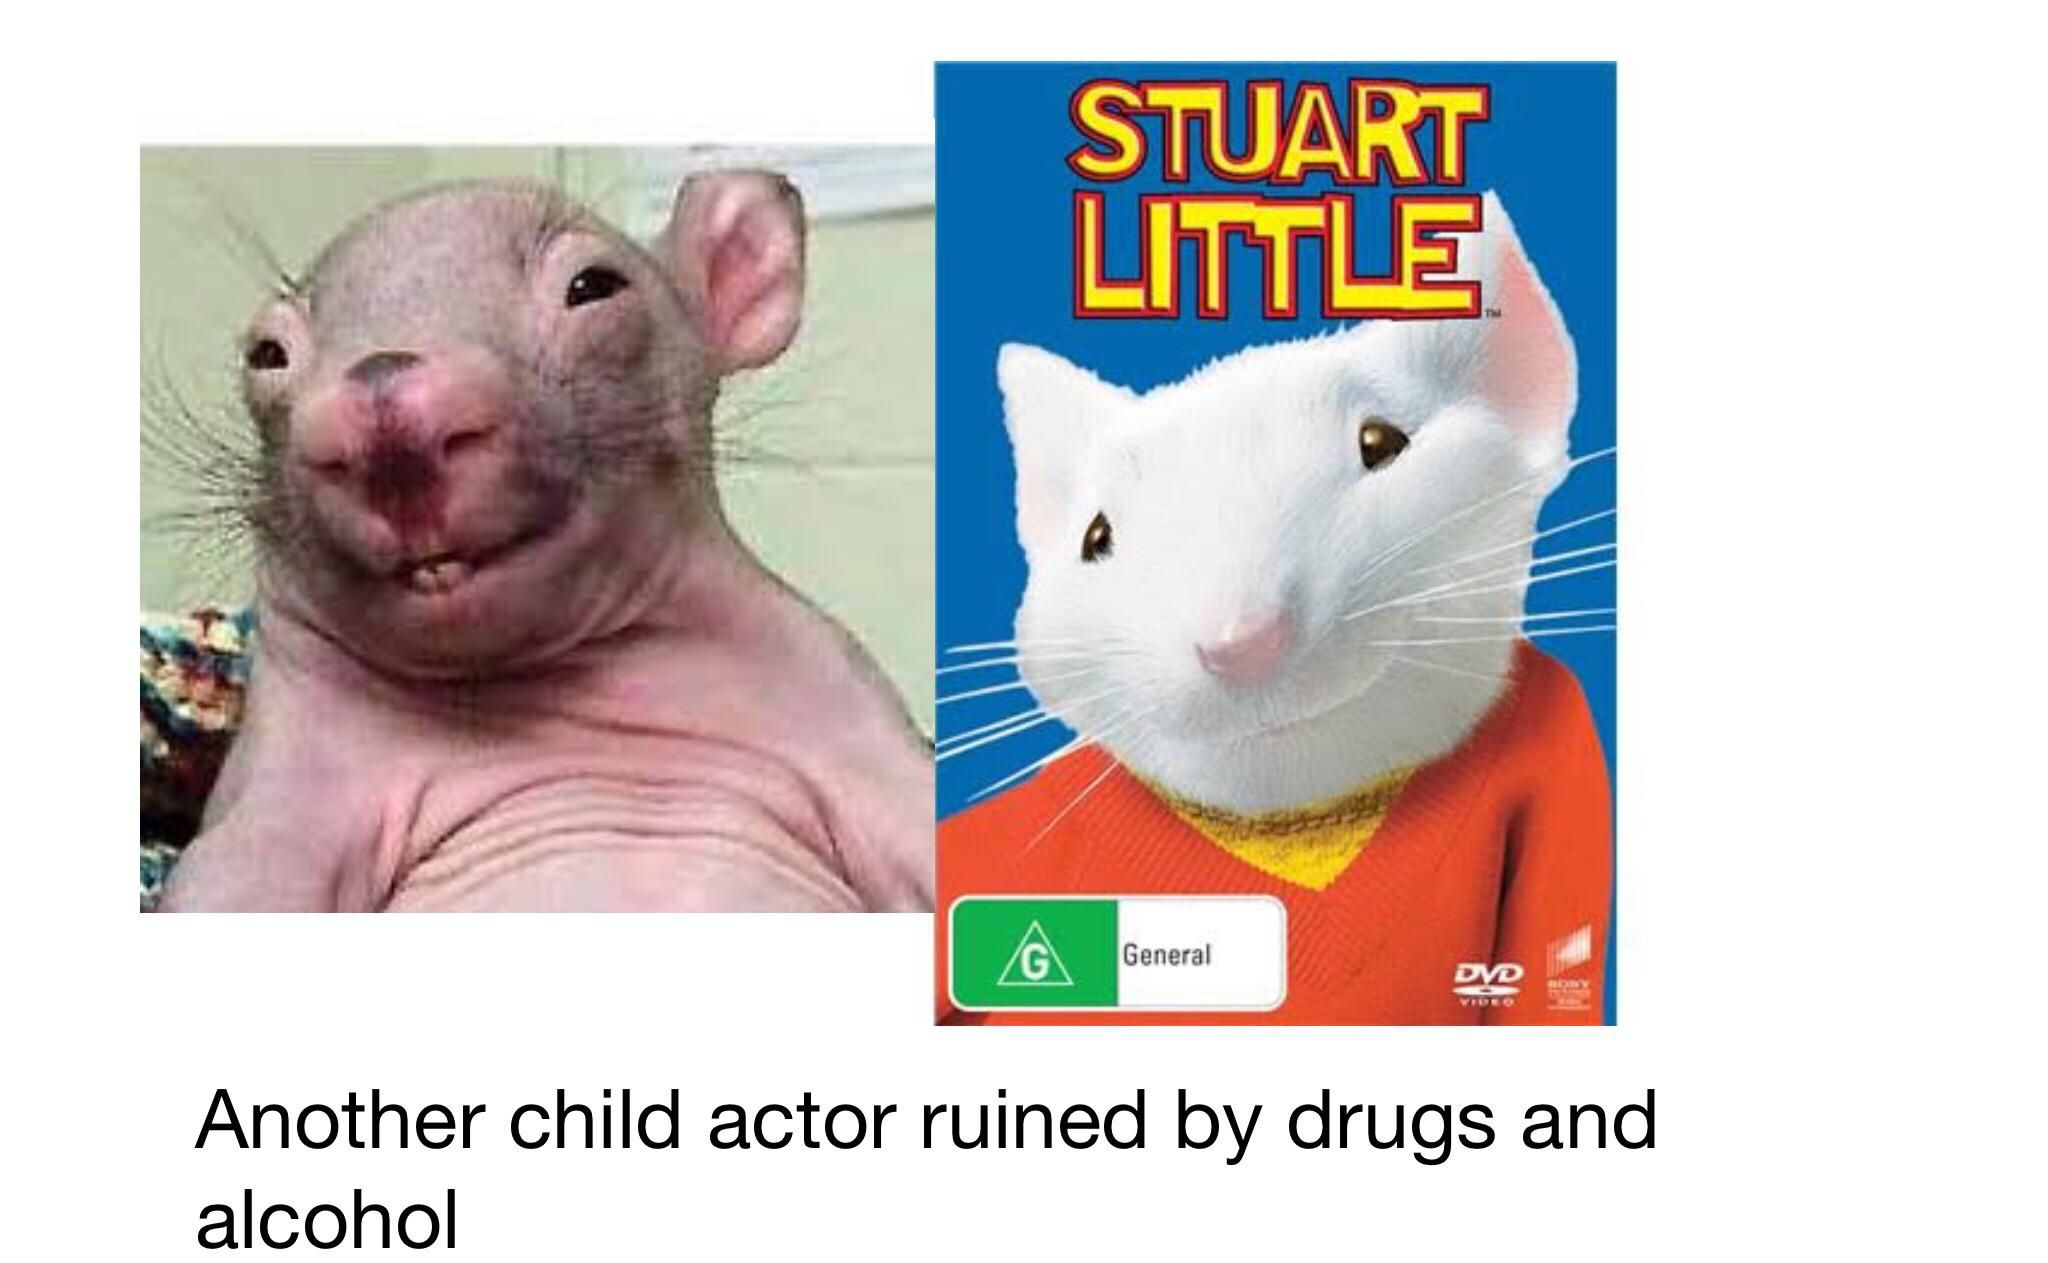 Poor Stuart little